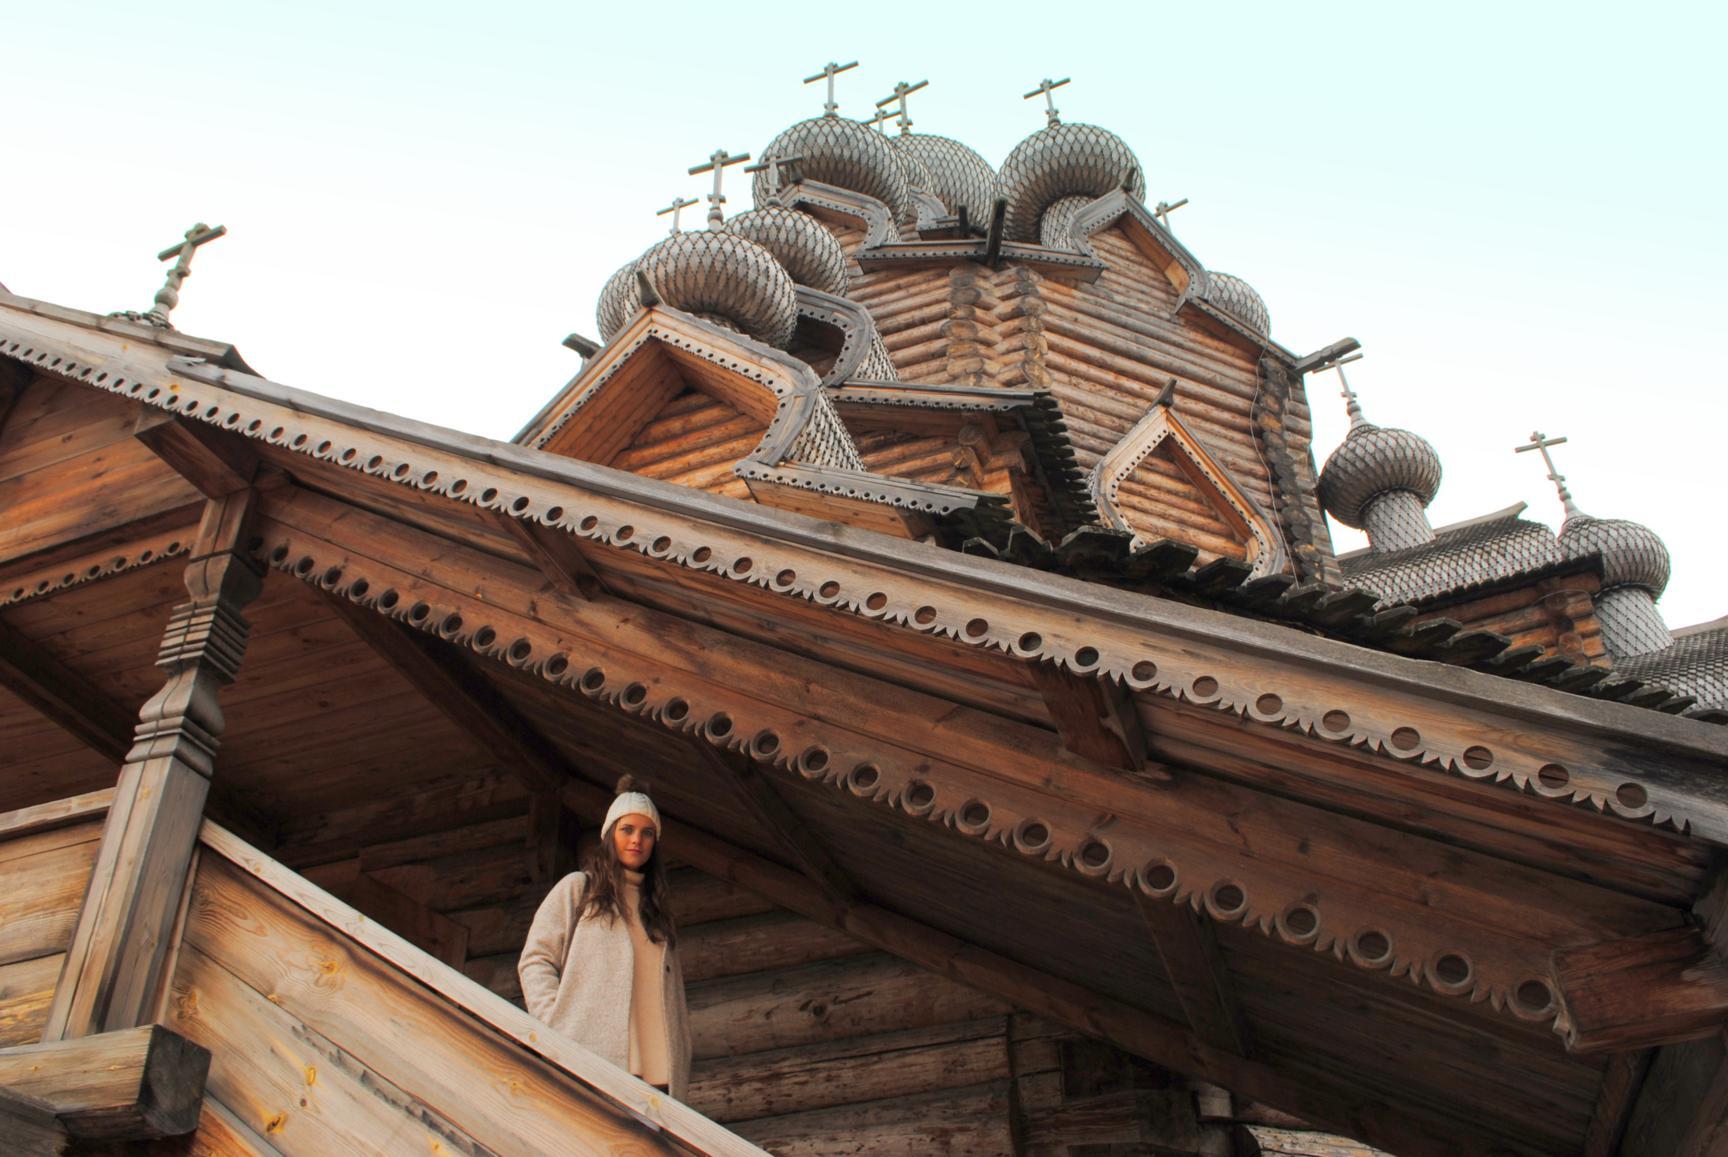 iglesia-intersecion-bogoslovka